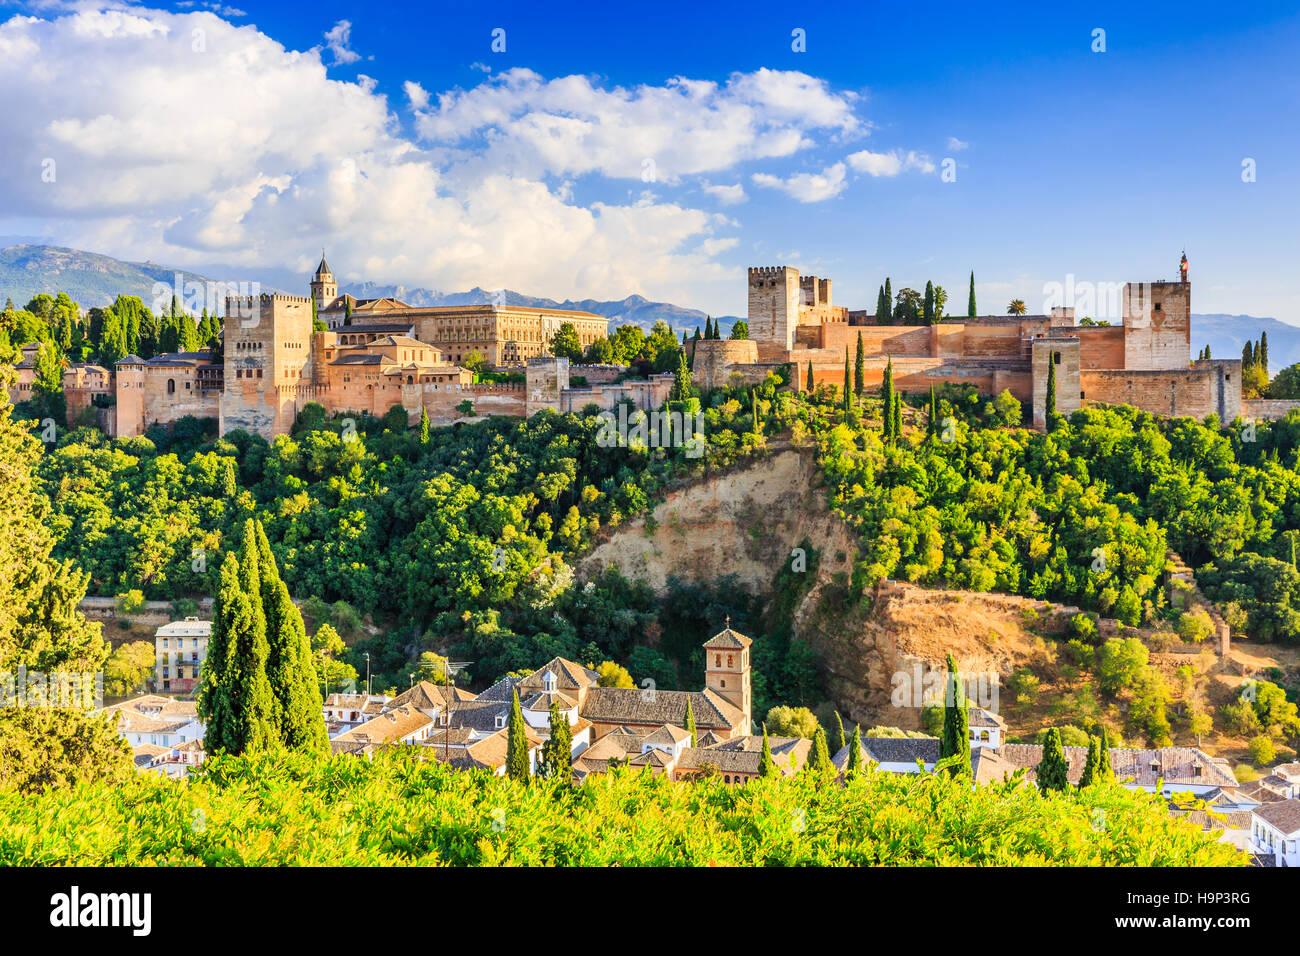 Alhambra von Granada, Spanien. Alhambra-Festung. Stockfoto